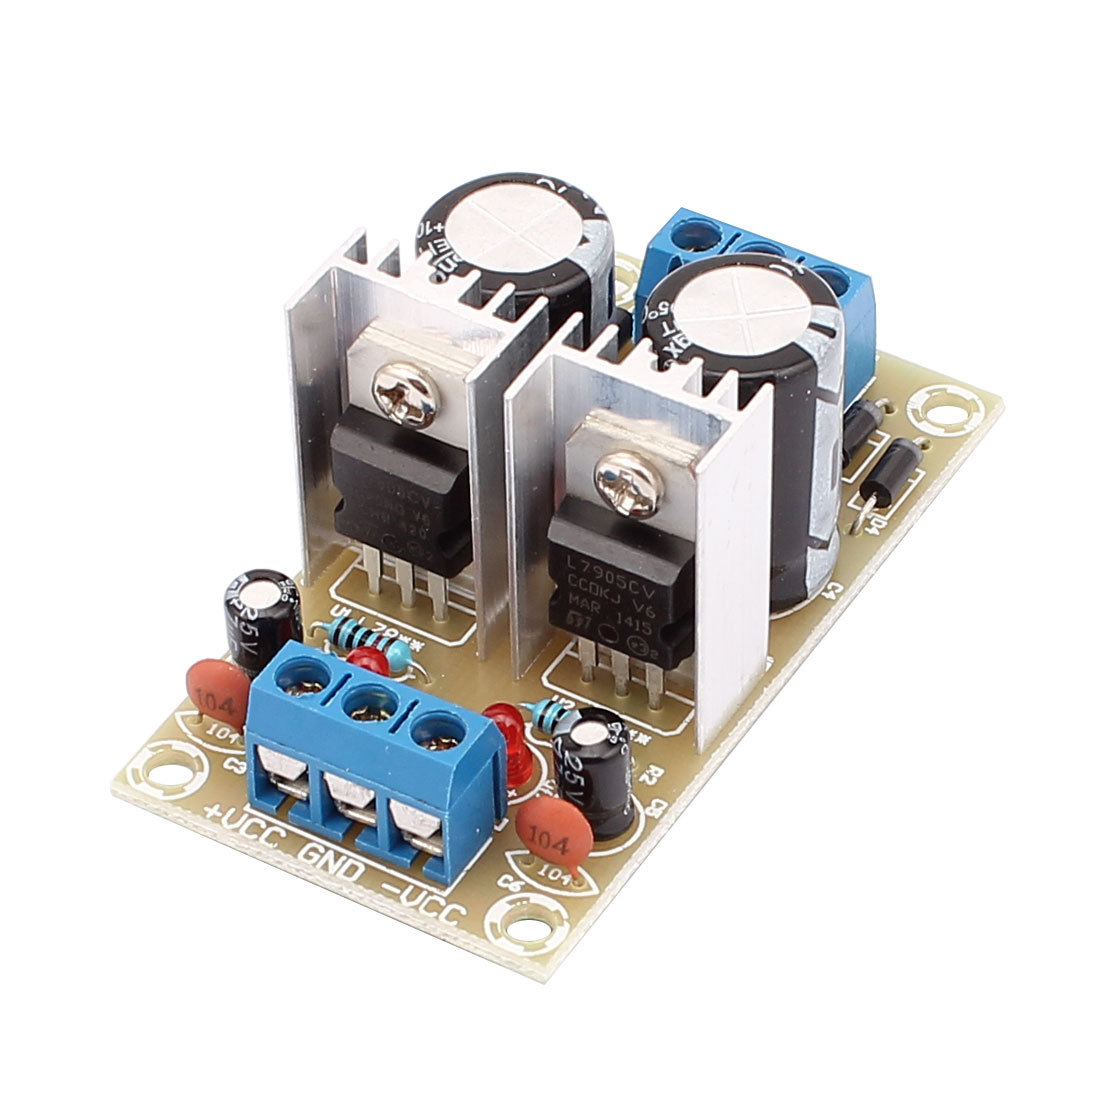 L7805 L7905 DC +/-5V Output Dual Voltage Regulator Module 62mm x 33mm x 25mm